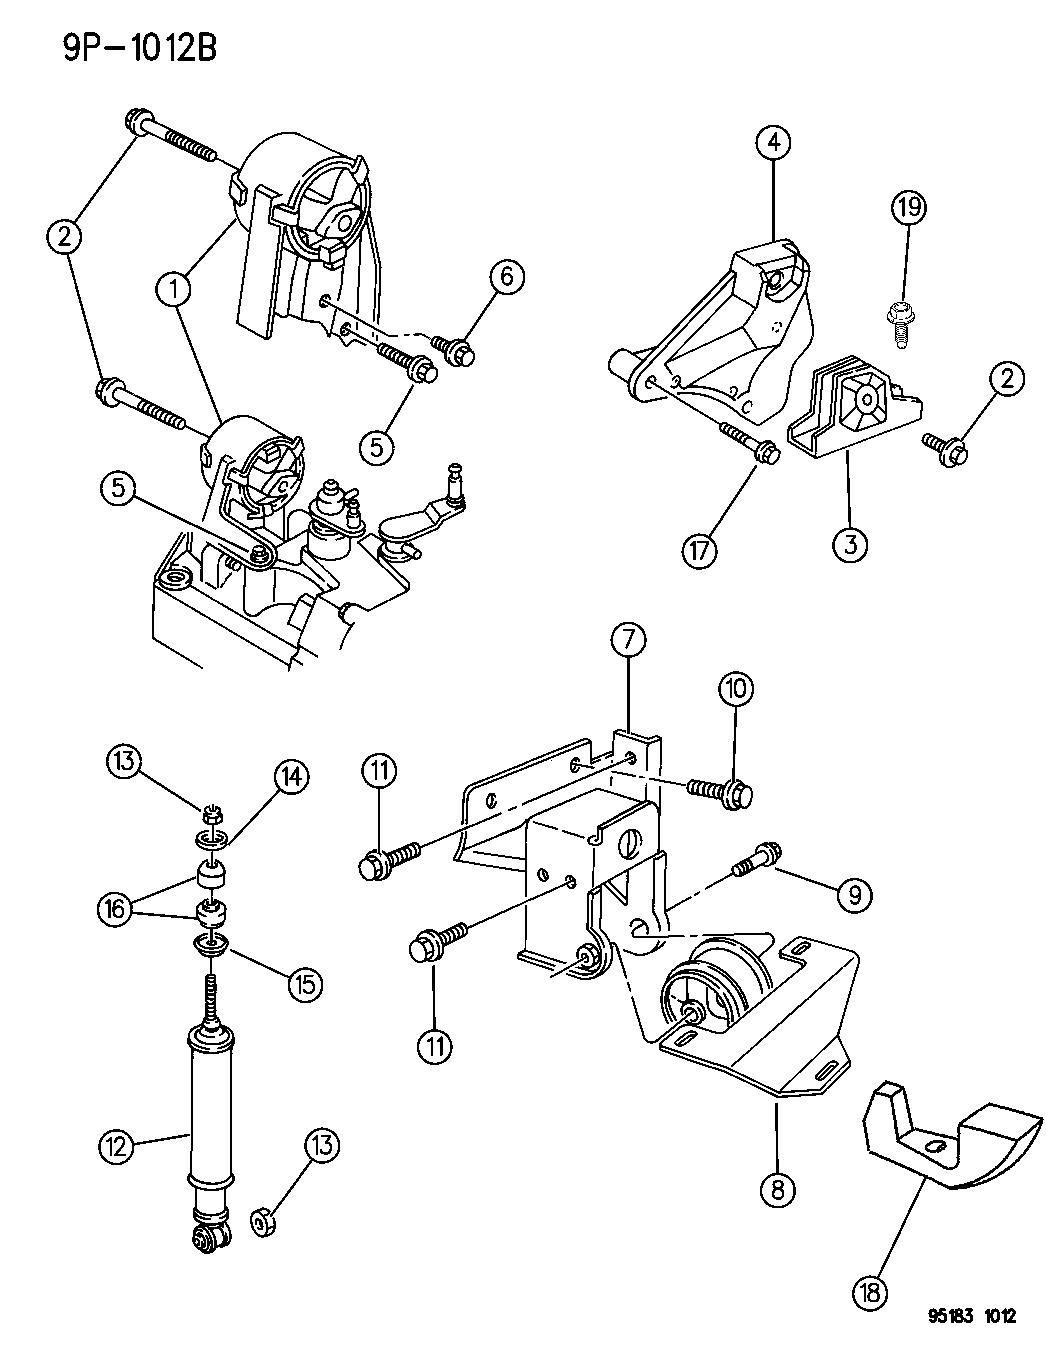 1995 Dodge Neon Engine Mounts - Thumbnail 2